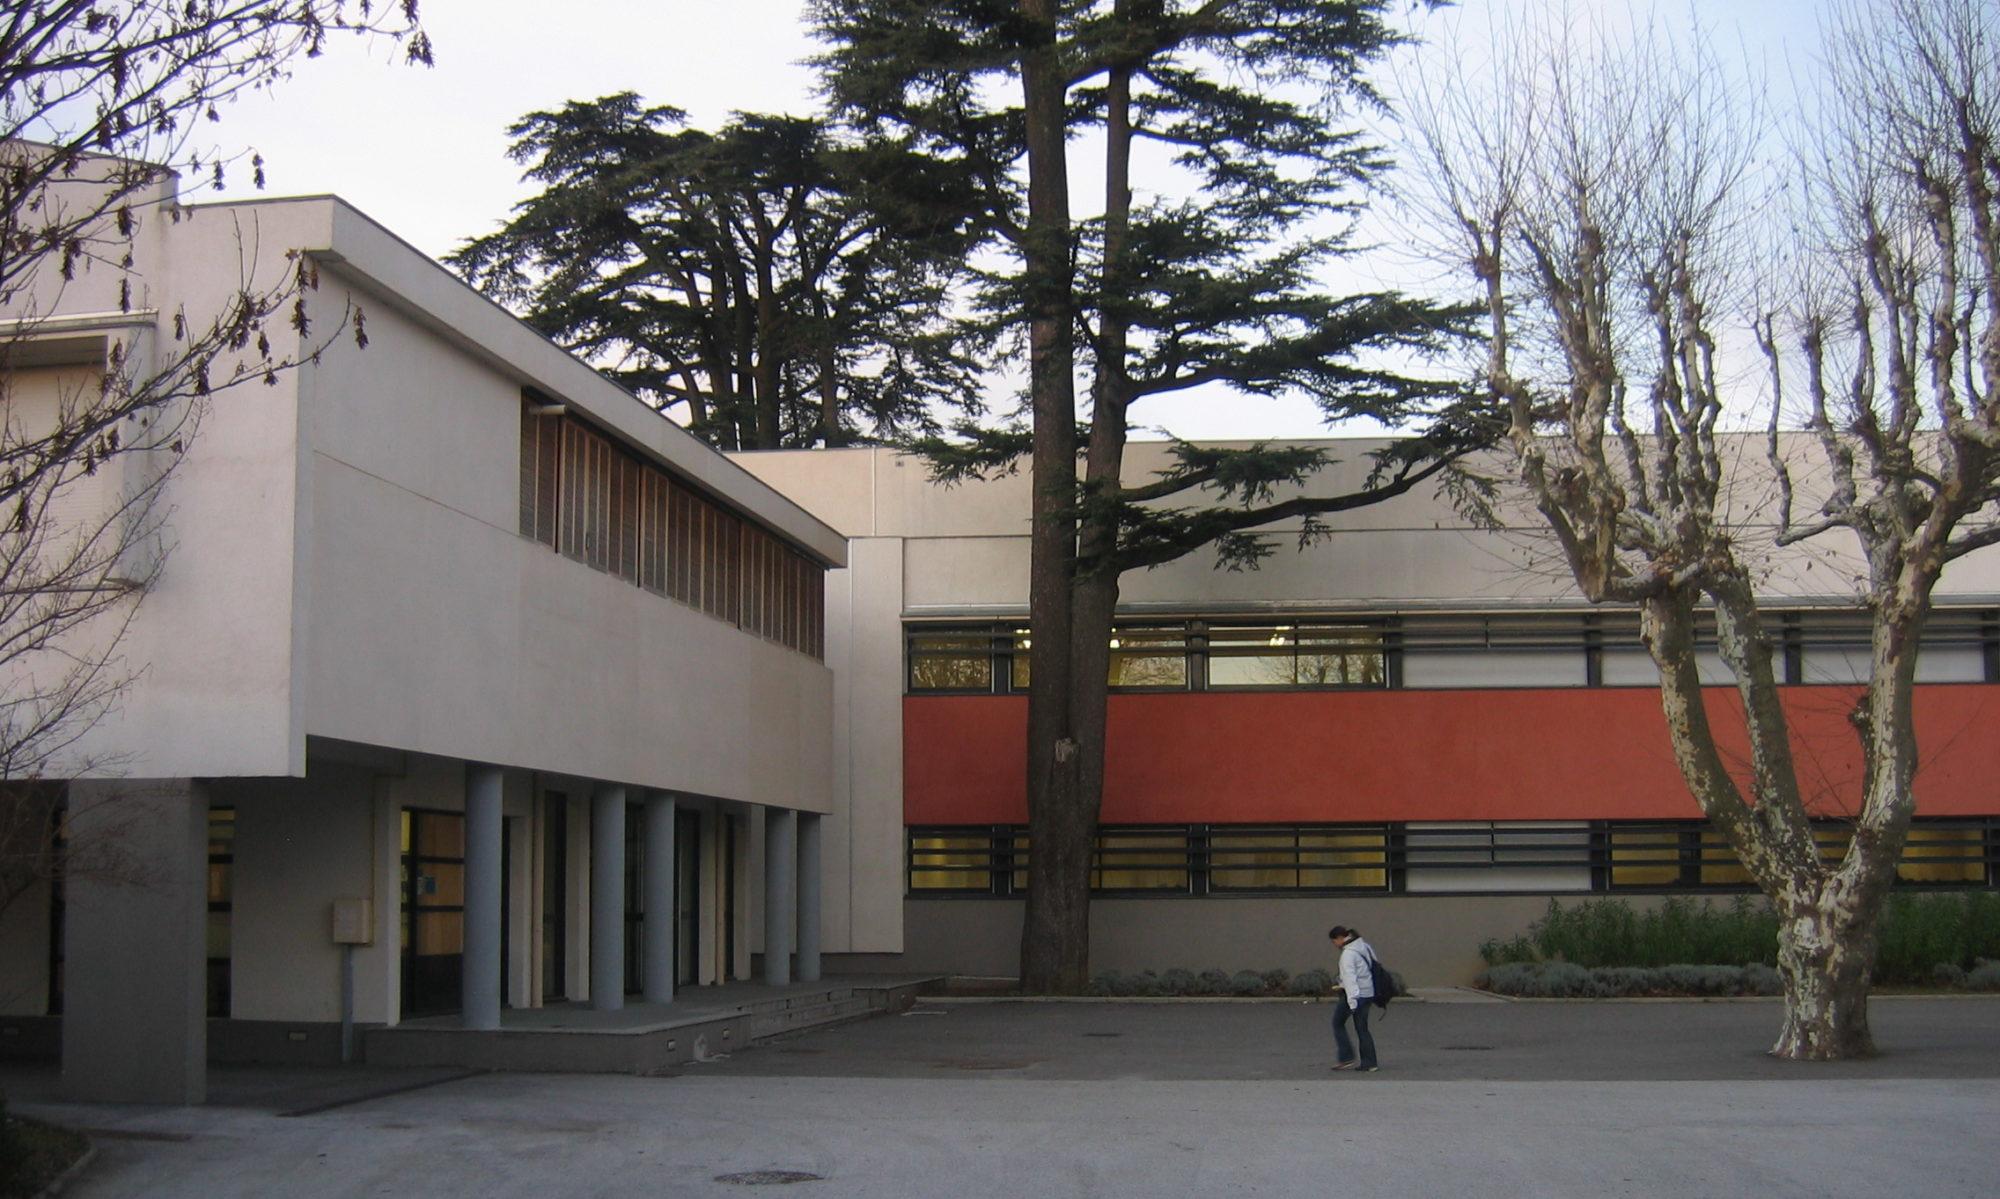 Lycée François Raynouard